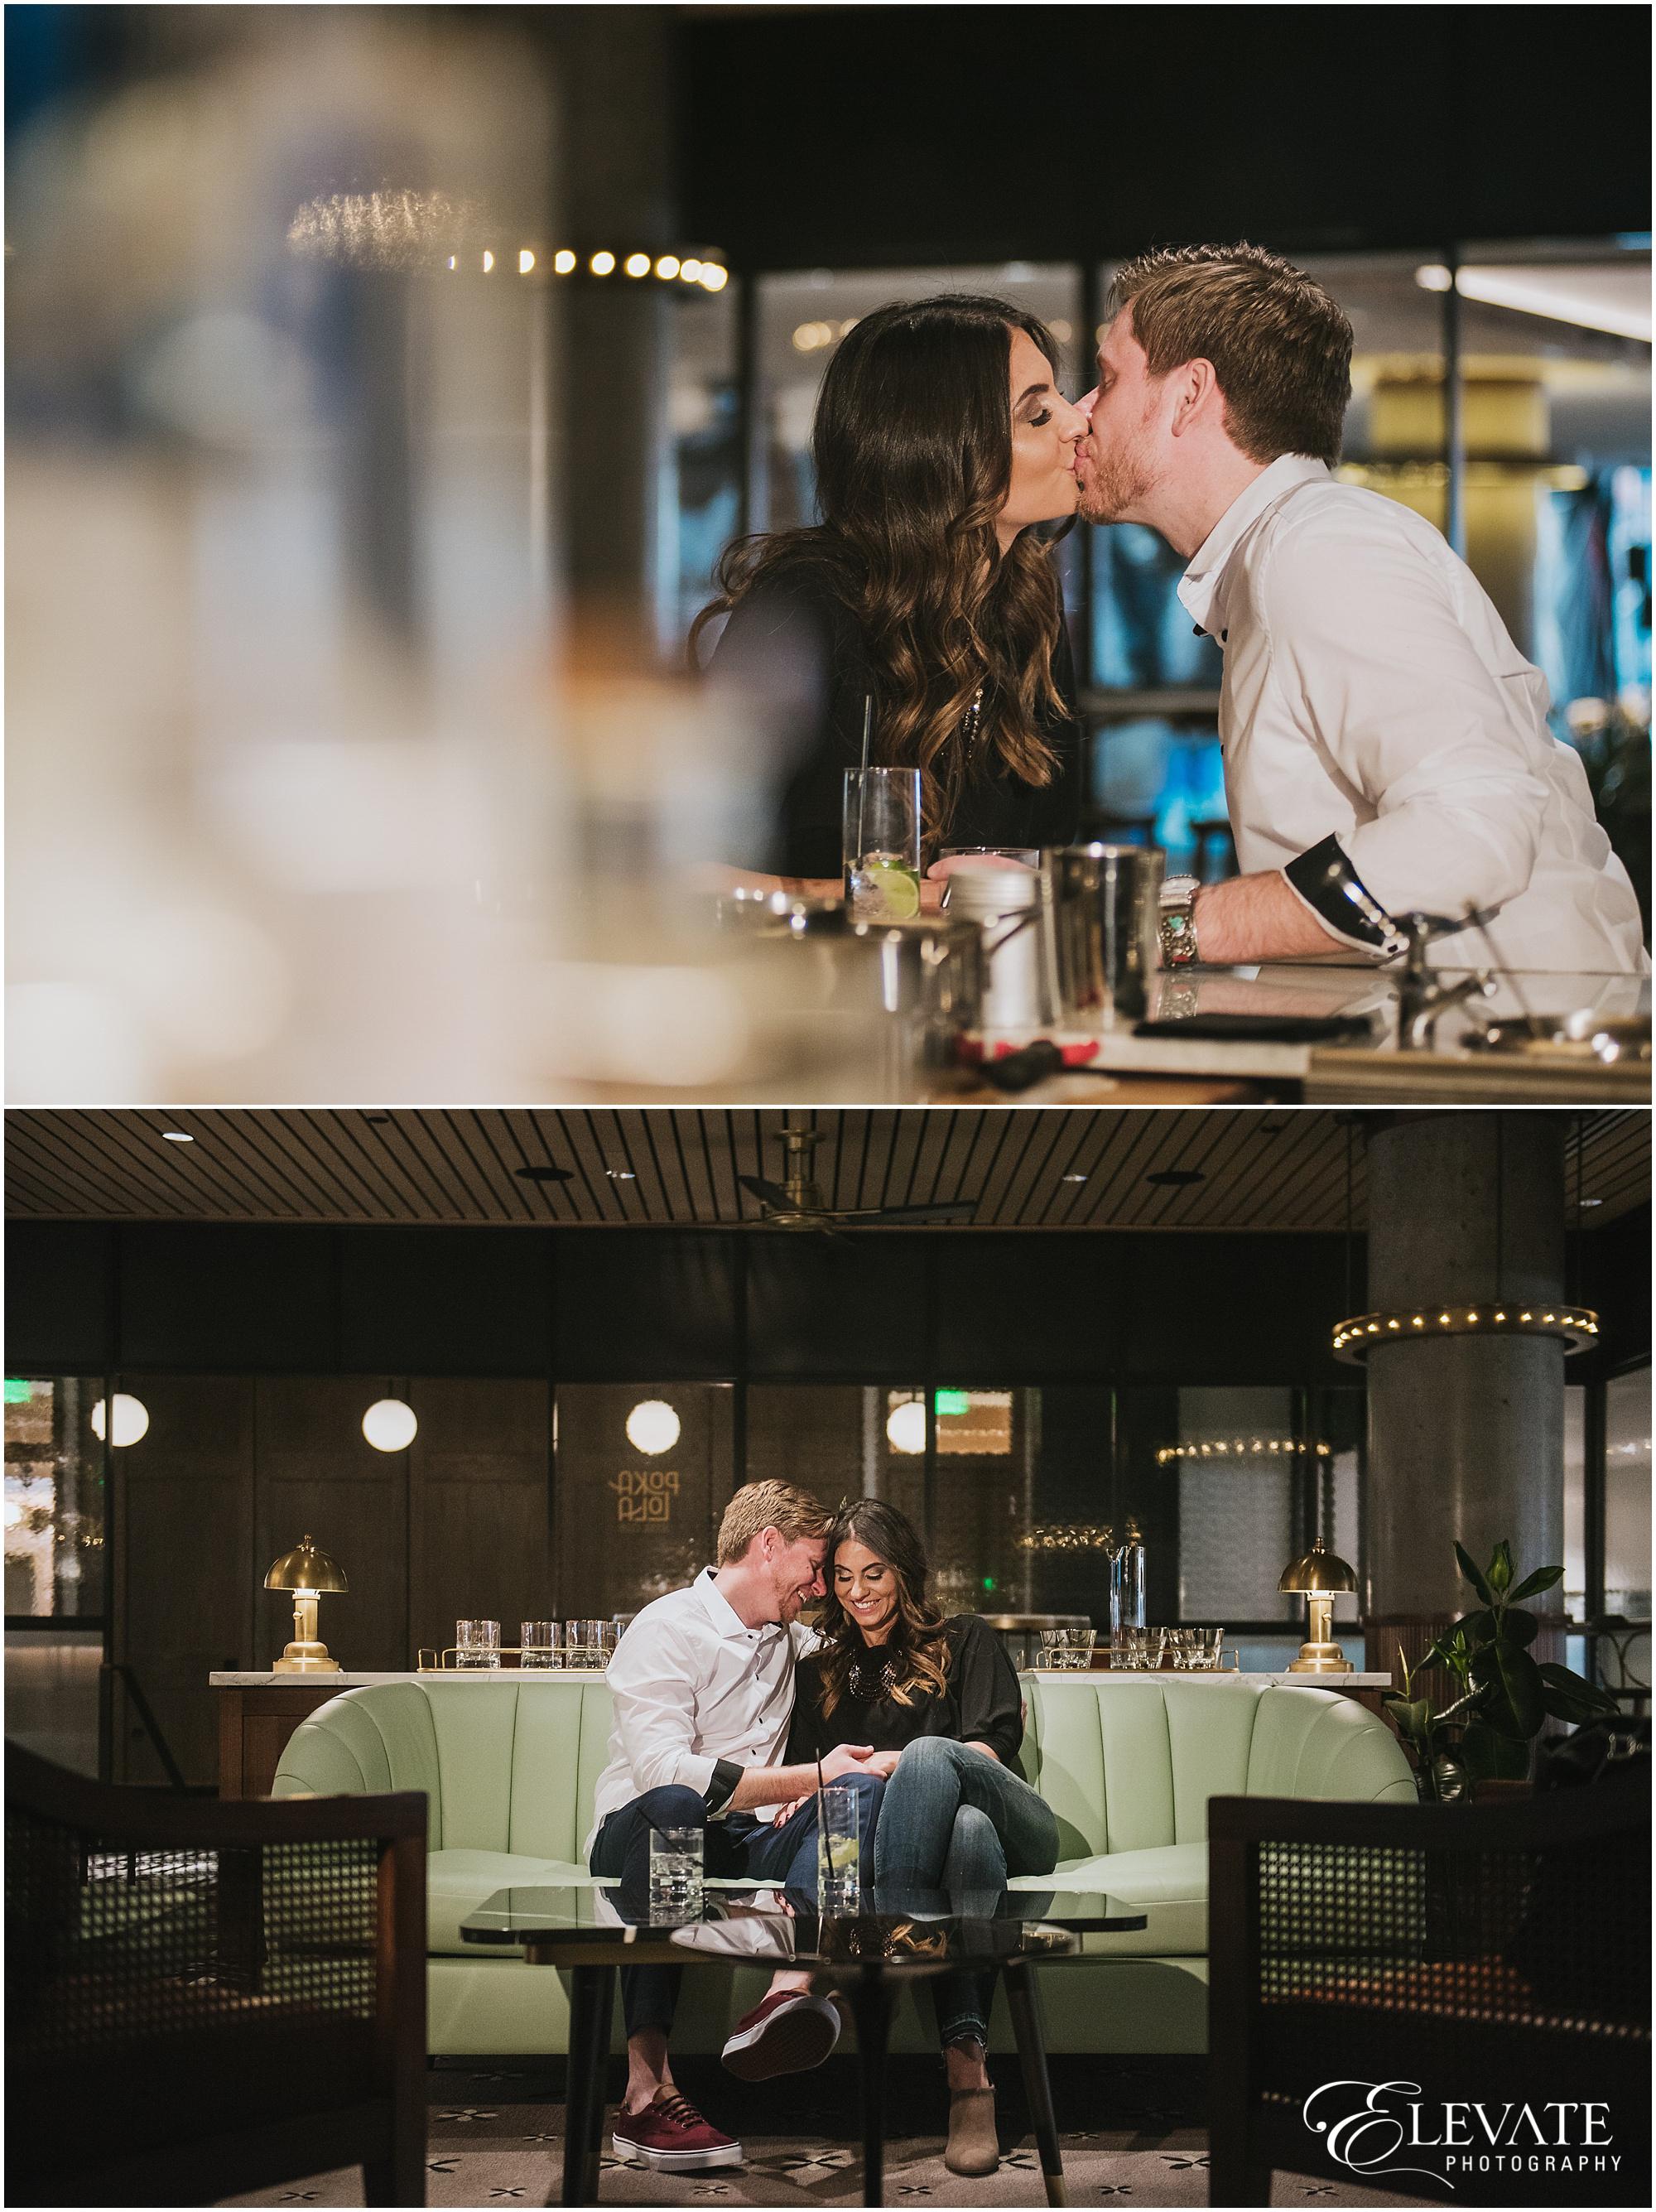 Jenn + Ryan   The Maven Hotel + Downtown Denver Engagement